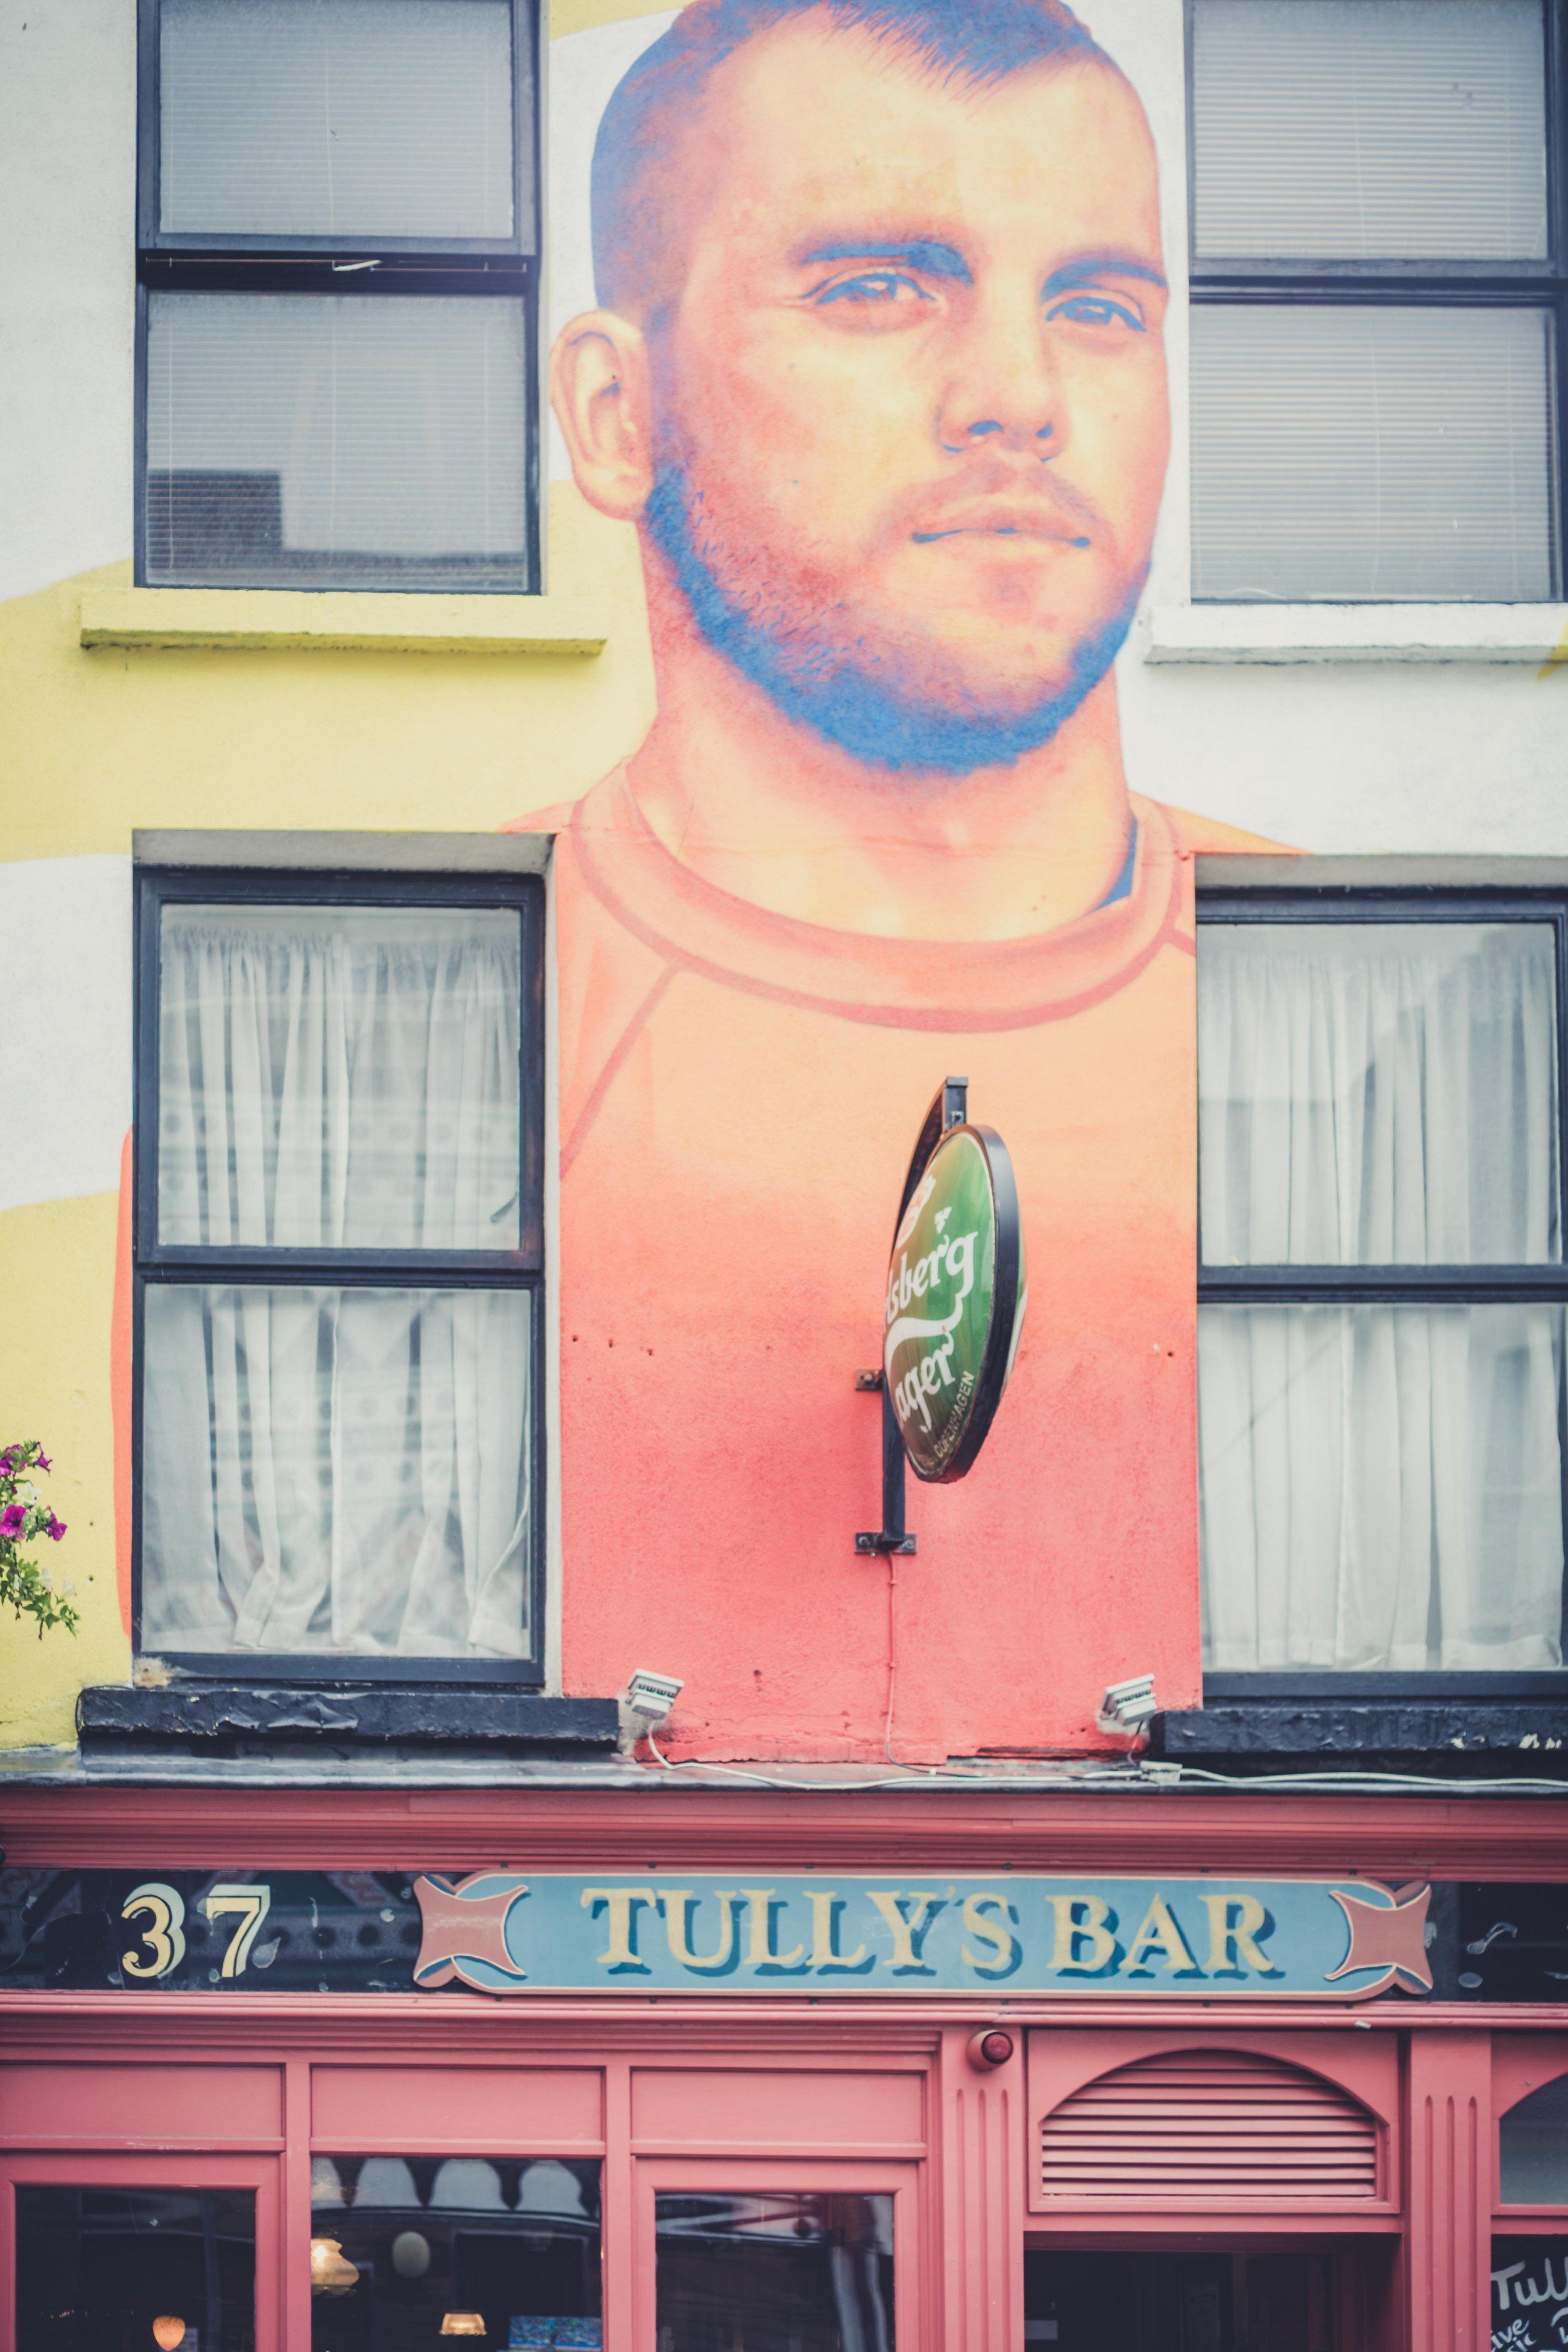 Tullys bar waterford ireland wall art.jpg